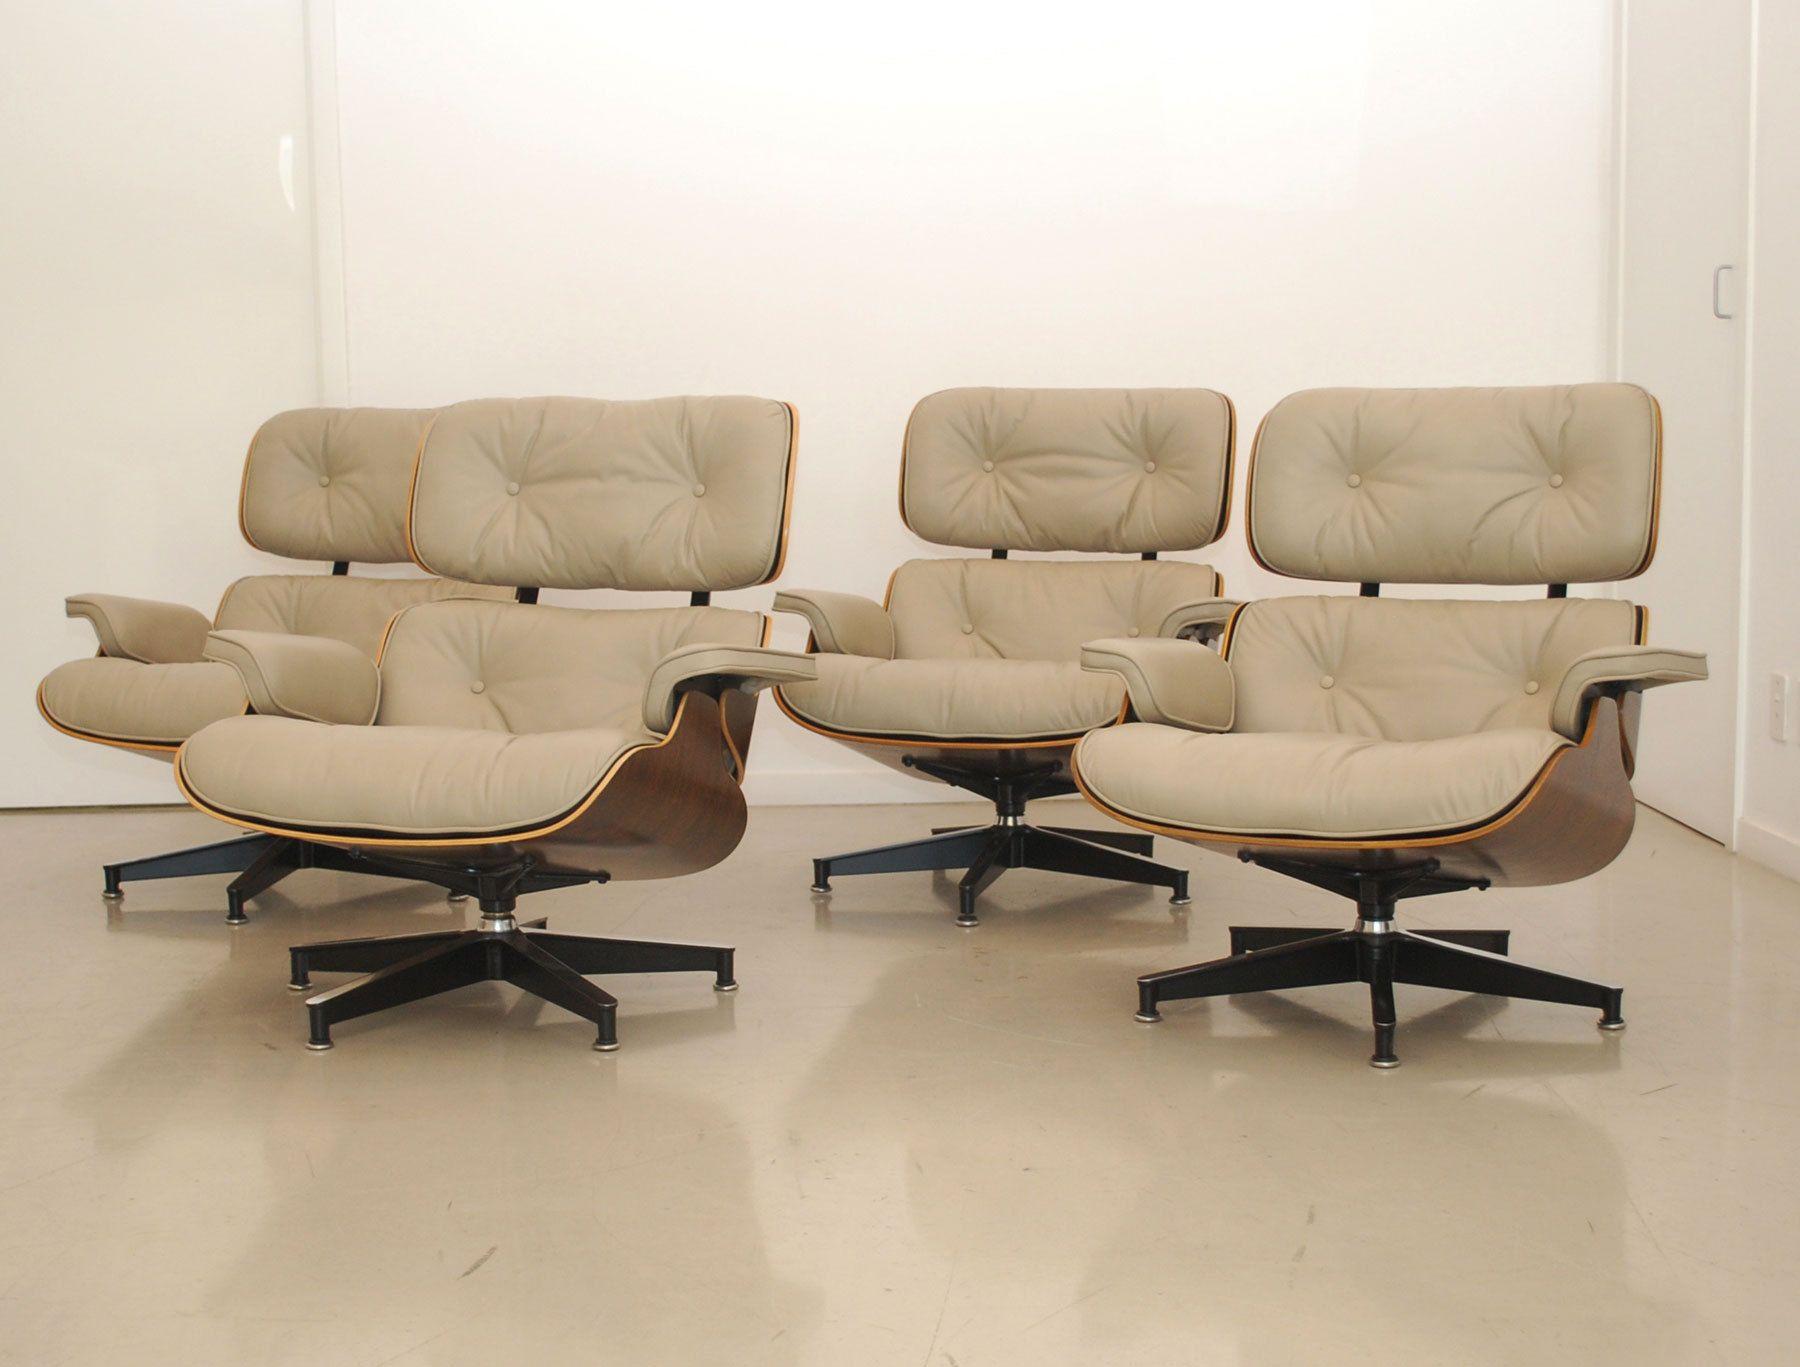 Herman Miller Lounge Chairs